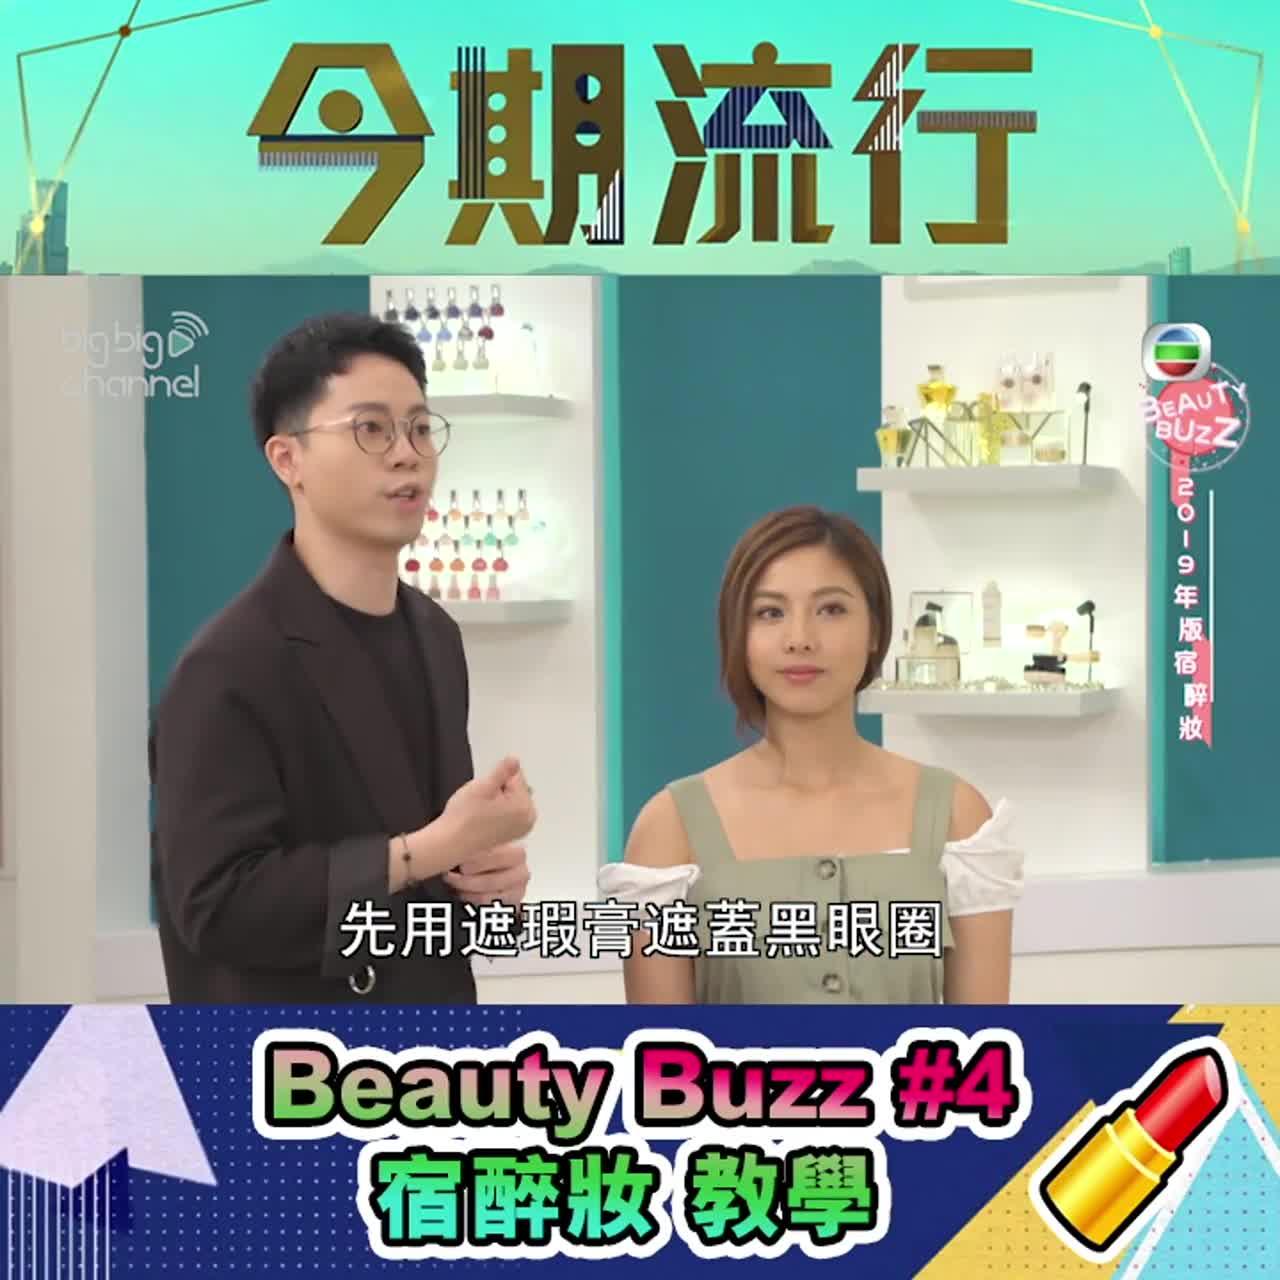 Beauty Buzz: 宿醉妝教學